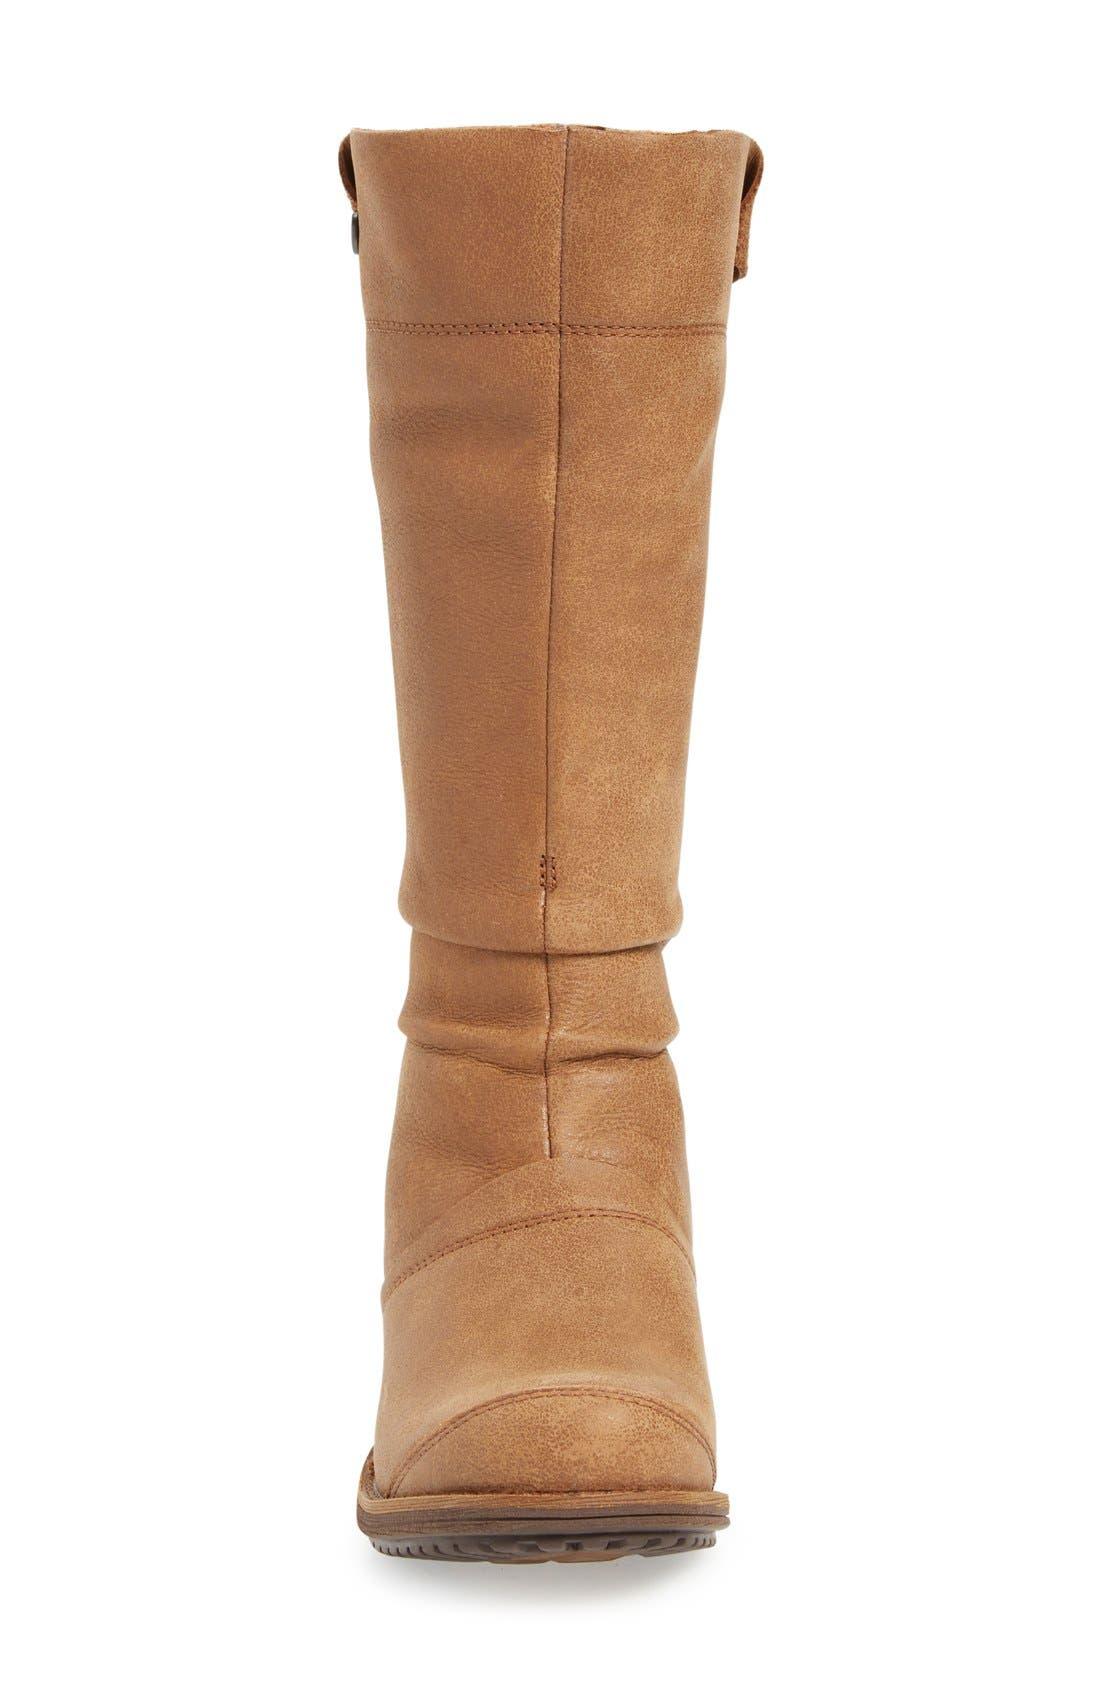 Alternate Image 3  - The North Face 'Bridgeton' Waterproof Tall Boot (Women)